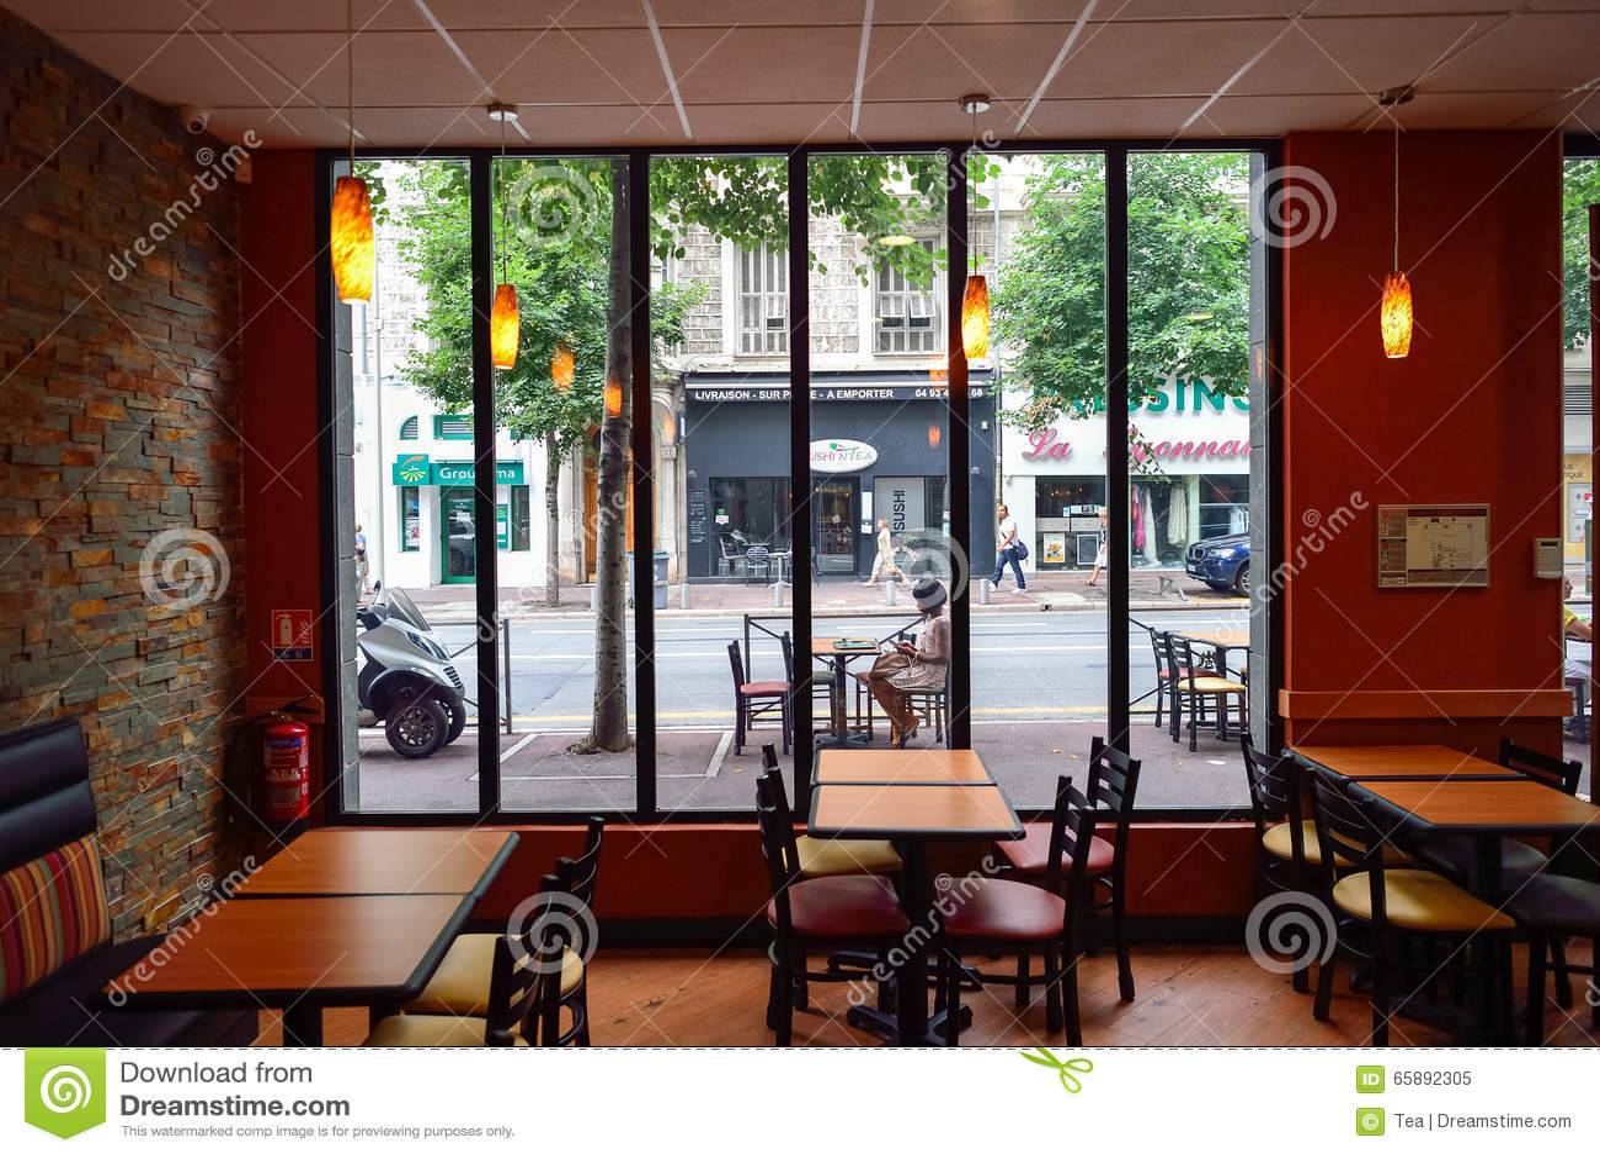 Subway fast food restaurant interior editorial image